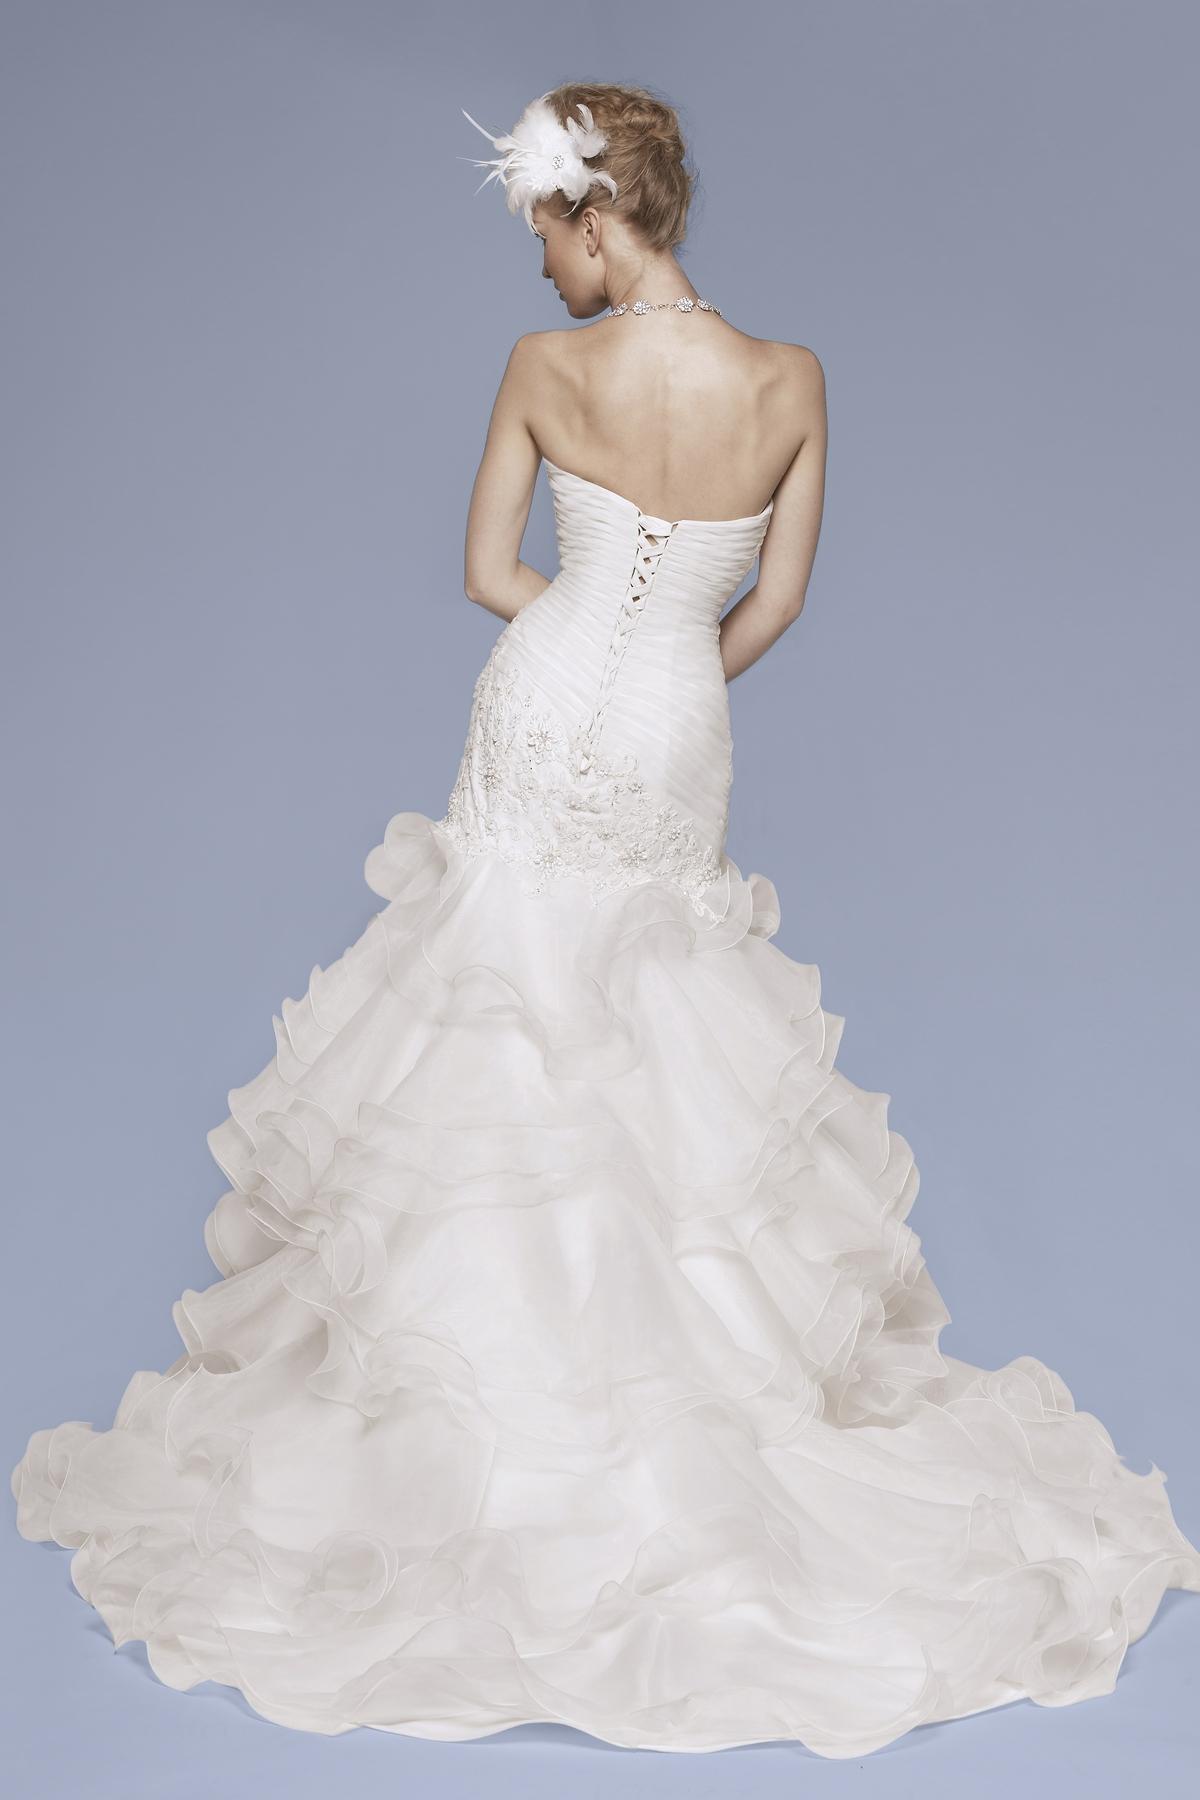 Liz Fields Spring Summer 2012 Bridal Collection I Fashionbride 39 S Weblog